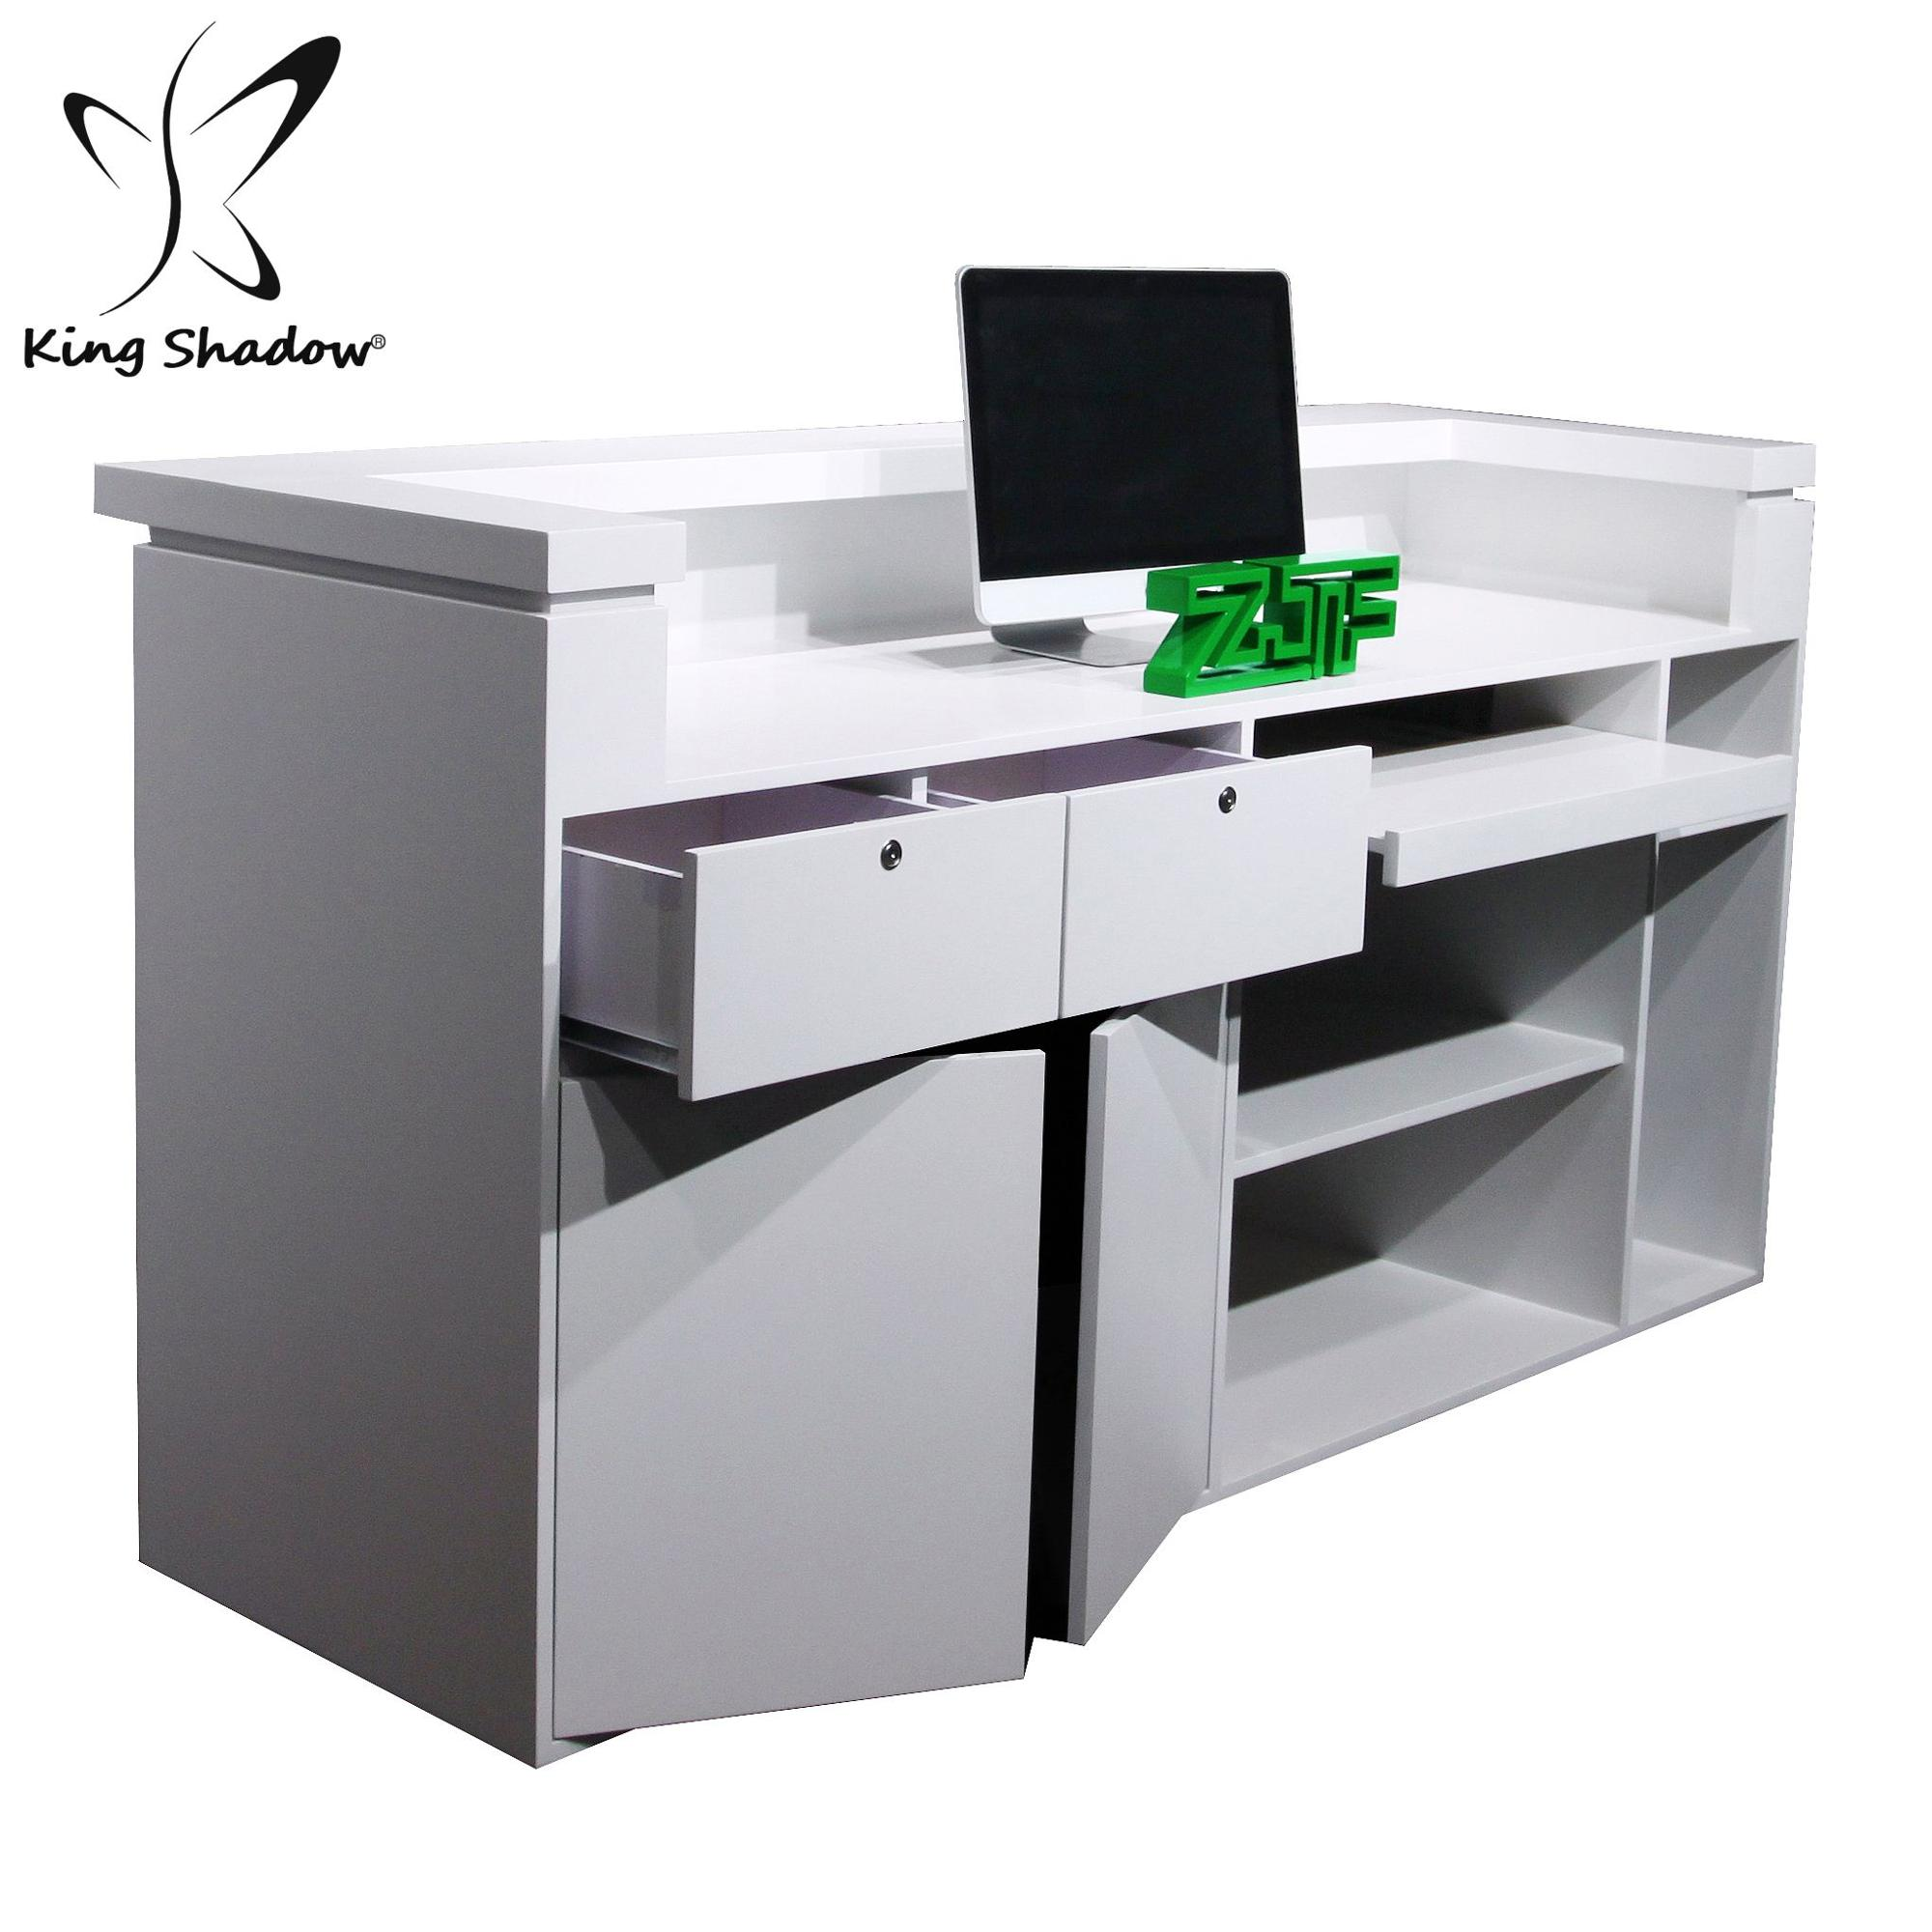 zoom for desk salon reception full diy trendy put size floor wonderful we the design